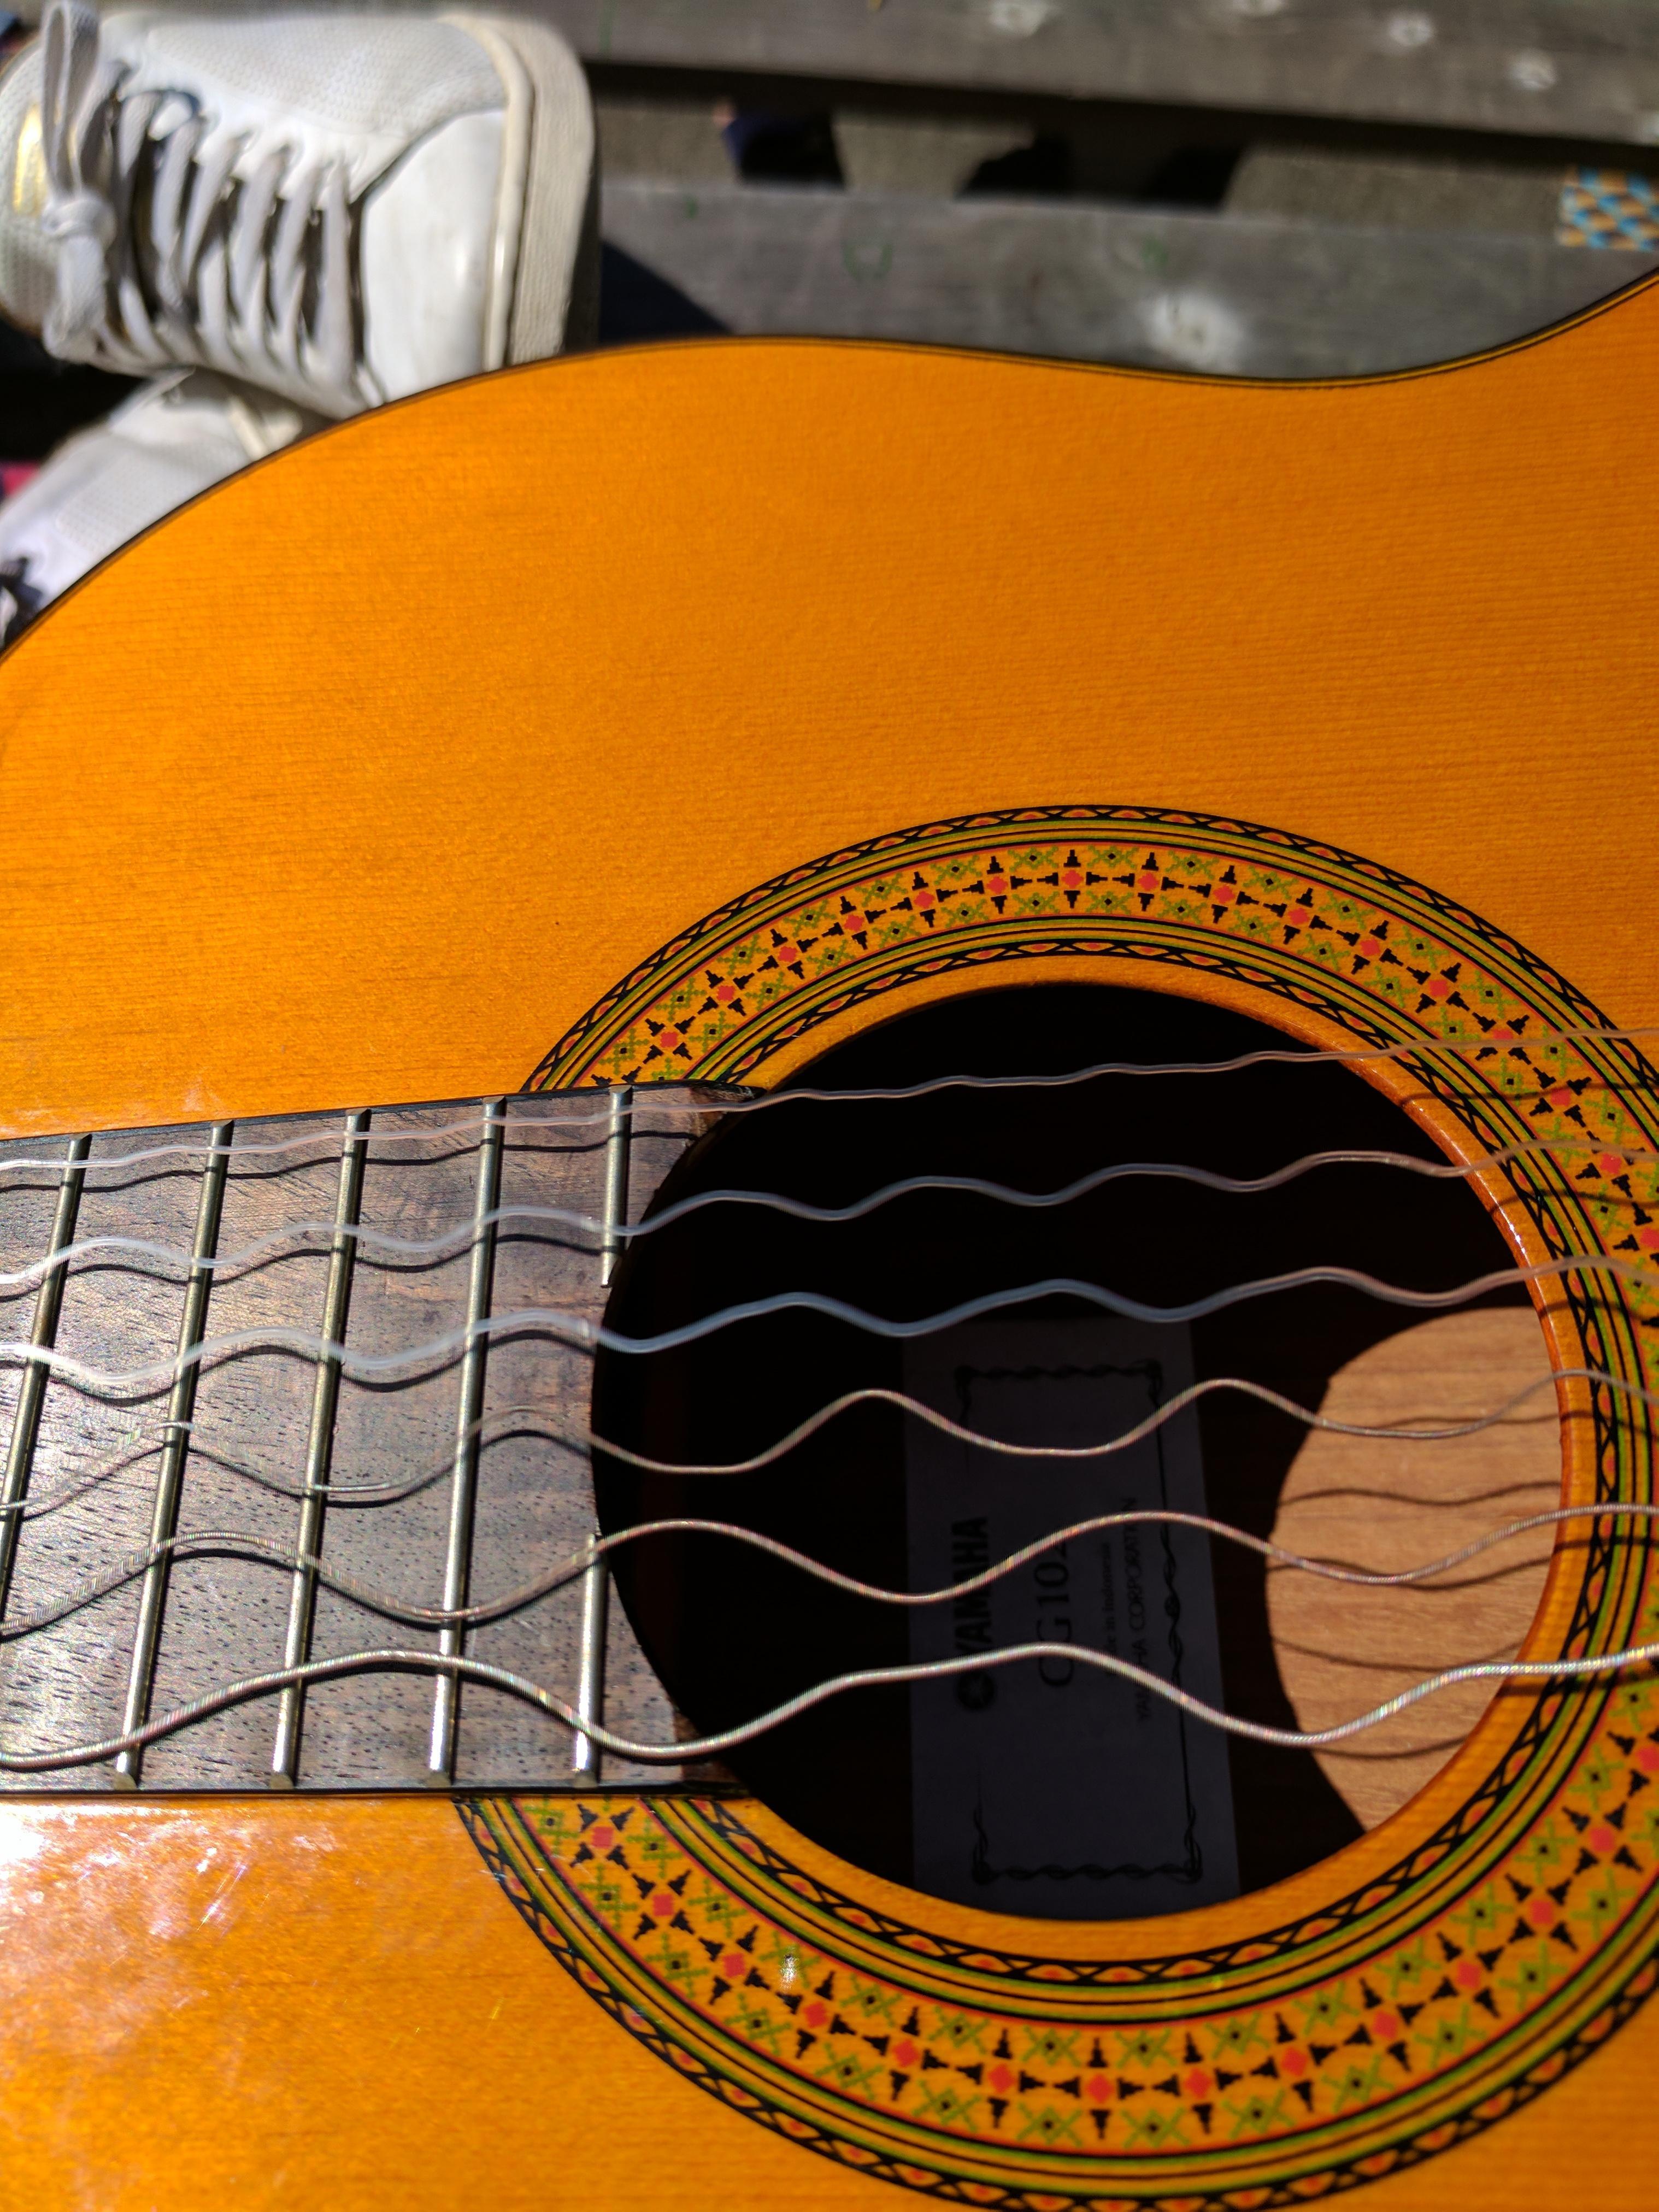 Wavelengths of guitar strings captured on camera : mildlyinteresting